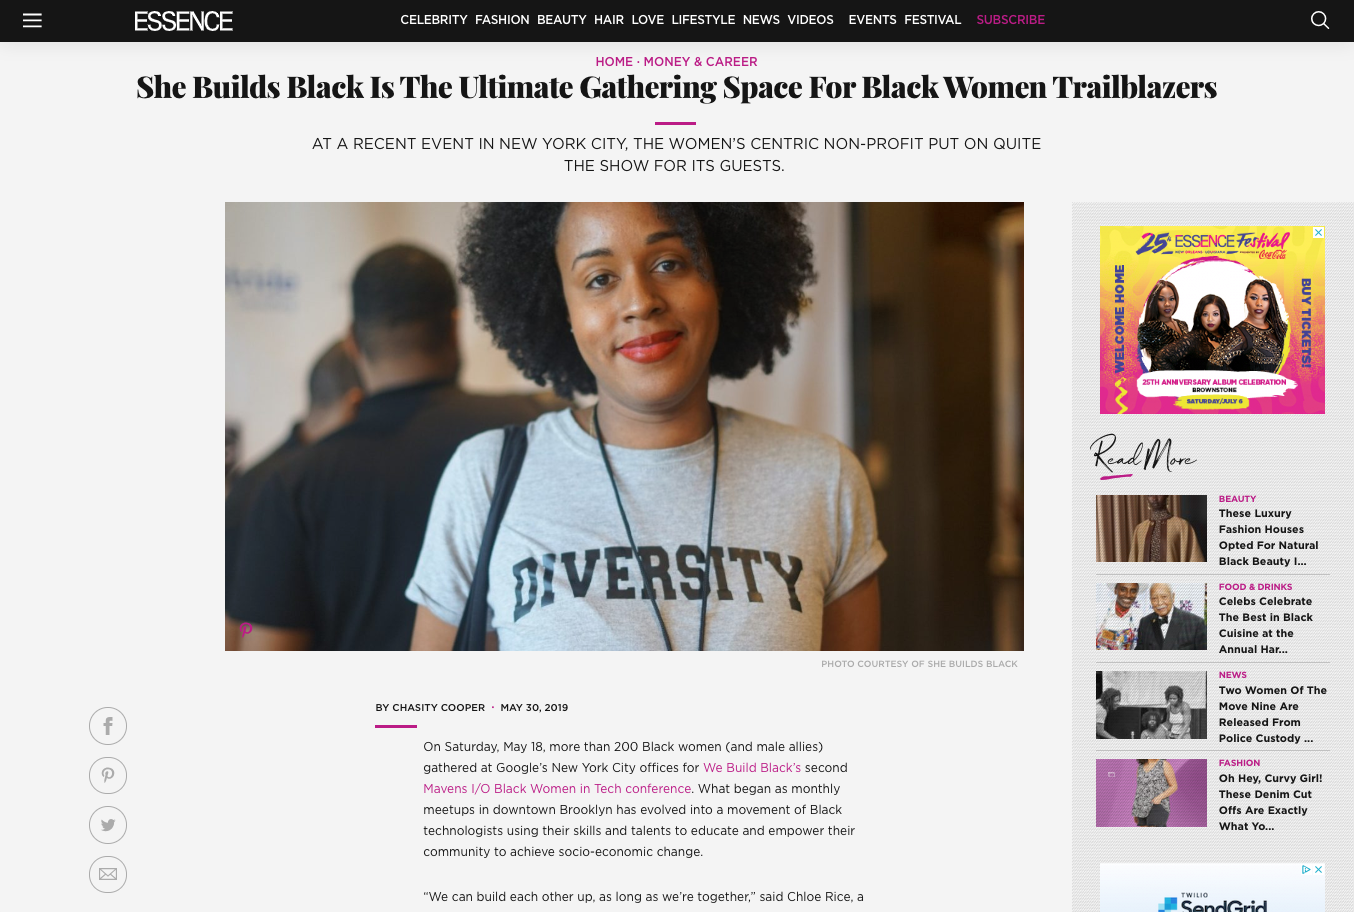 She Builds Black feature on Essence.com